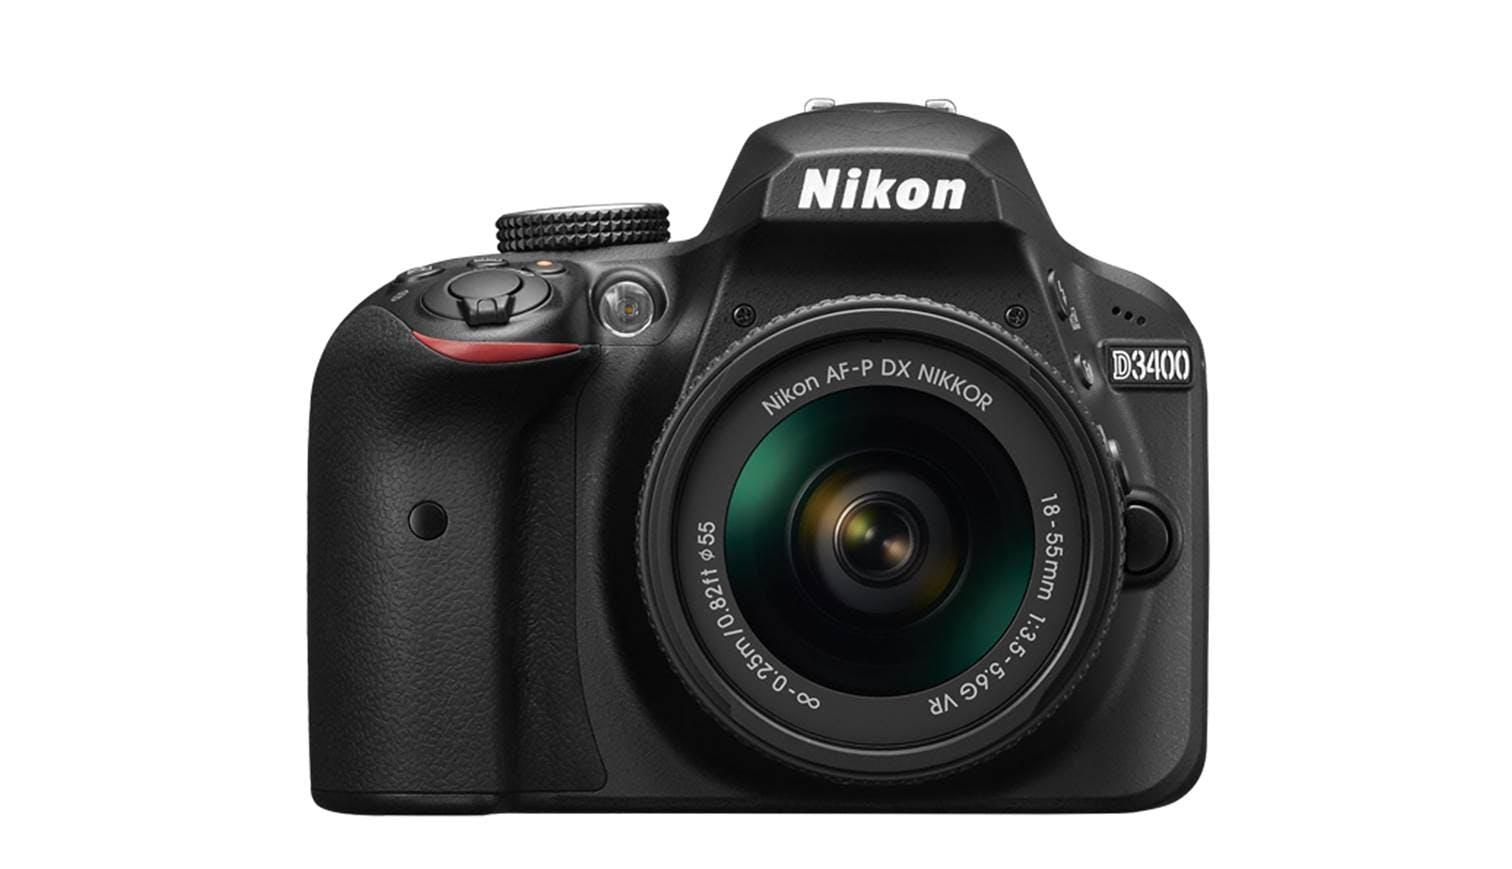 Camera Harvey Norman Dslr Cameras dslr camera nikon canon harvey norman d3400 with 18 55mm lens kit black